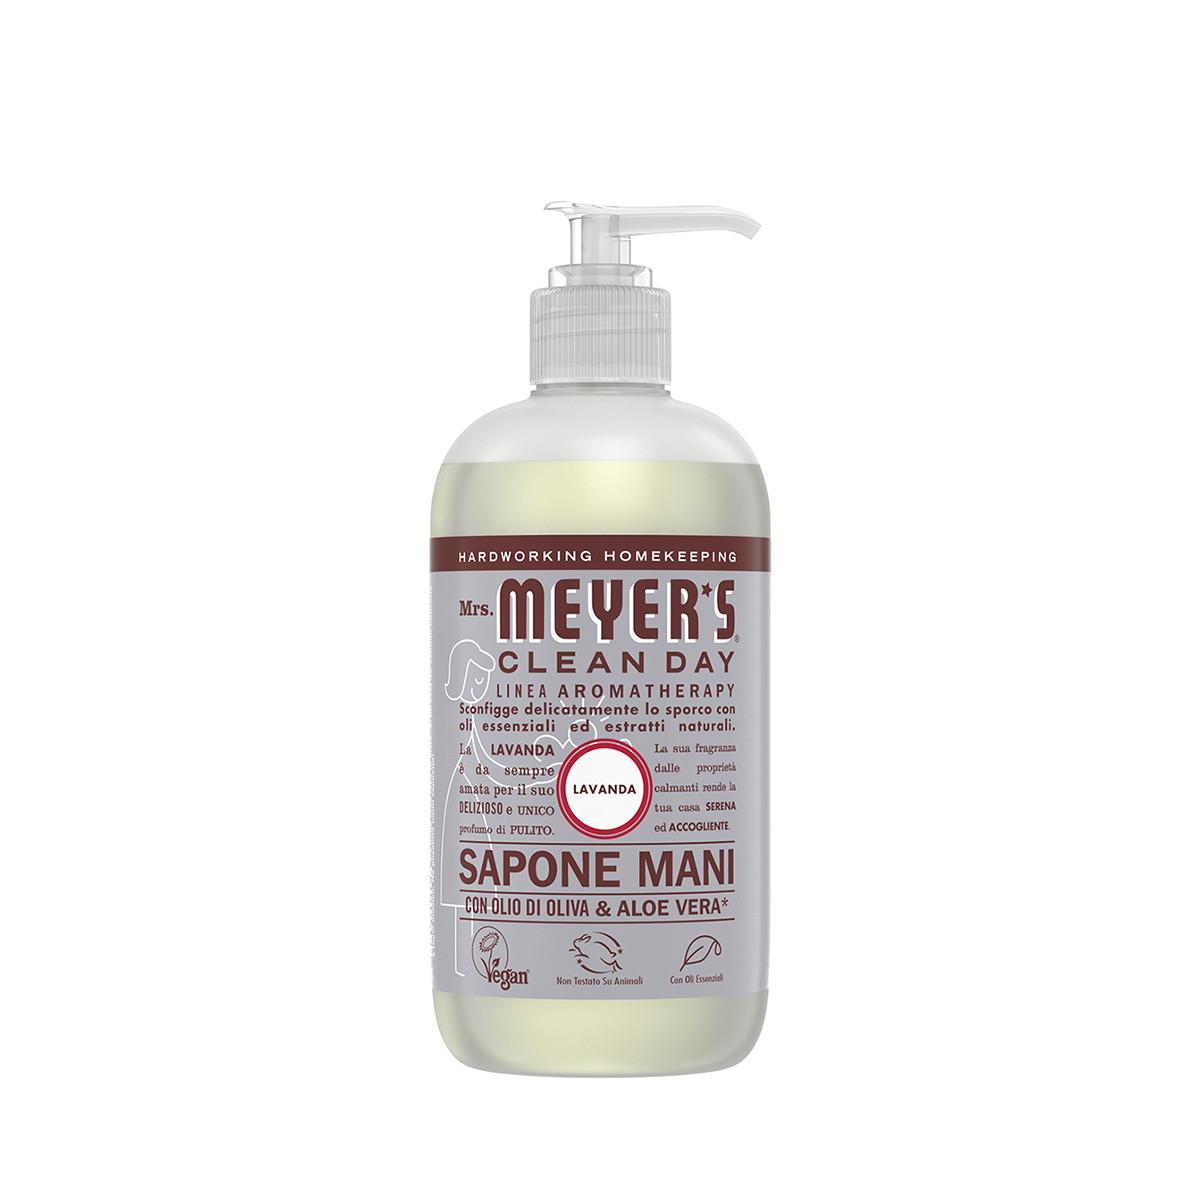 Sapone liquido per mani profumo di lavanda 370ml, Grigio, large image number 0